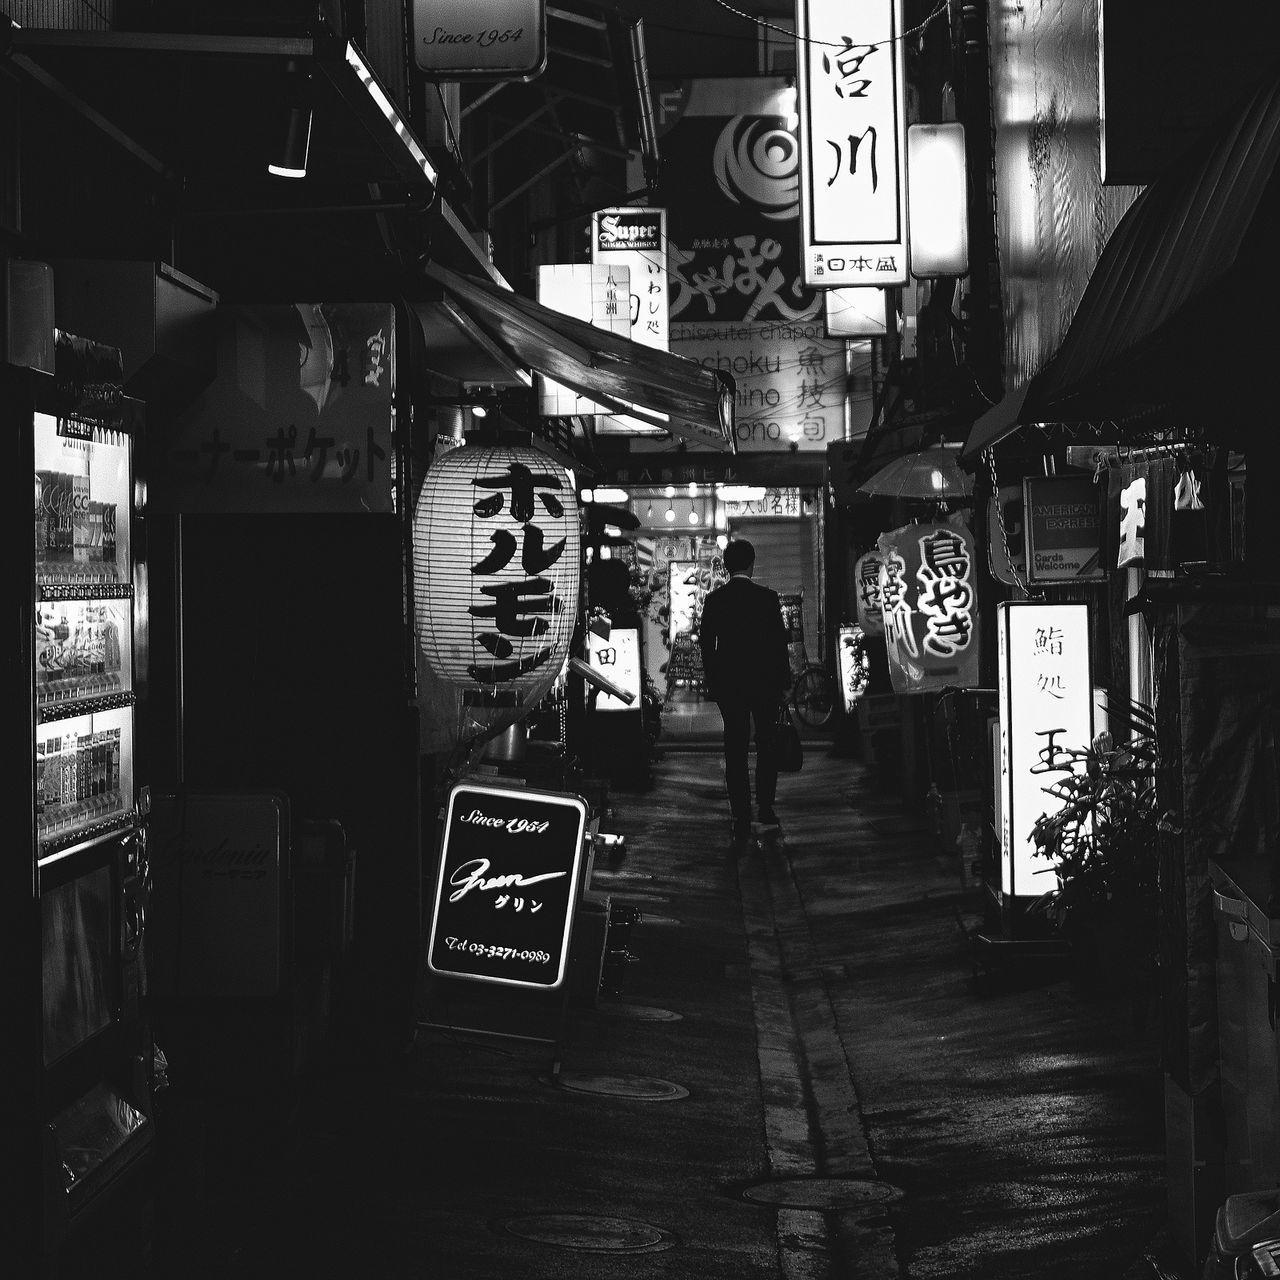 Streetphotography People Blackandwhite Tokyo Black And White Street Photography Streetphoto Japan Streetphoto_bw Streetphotography_bw B&w Street Photography Monochrome Photography The Week Of Eyeem